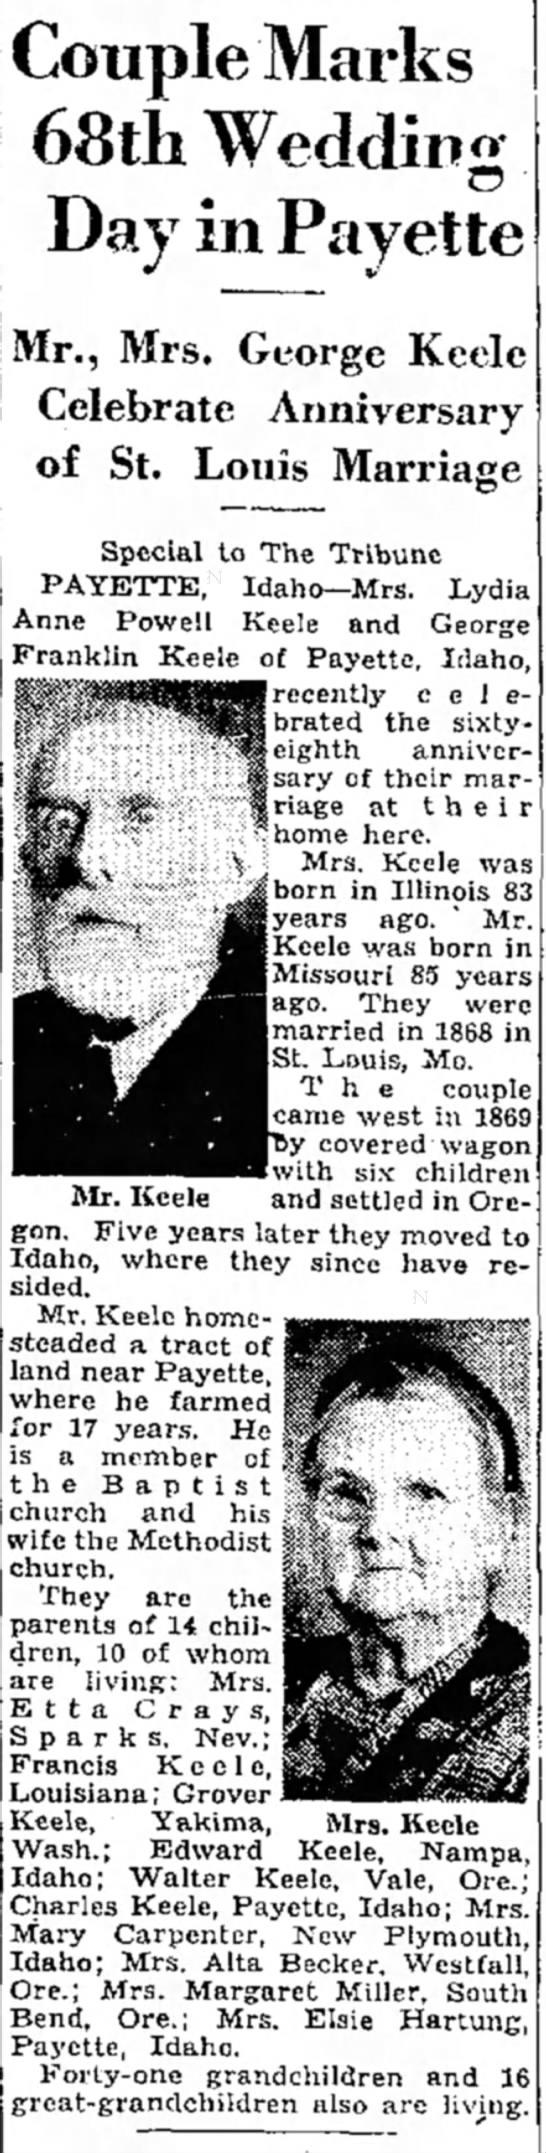 George Franklin KeeleJuly 30, 1936 -